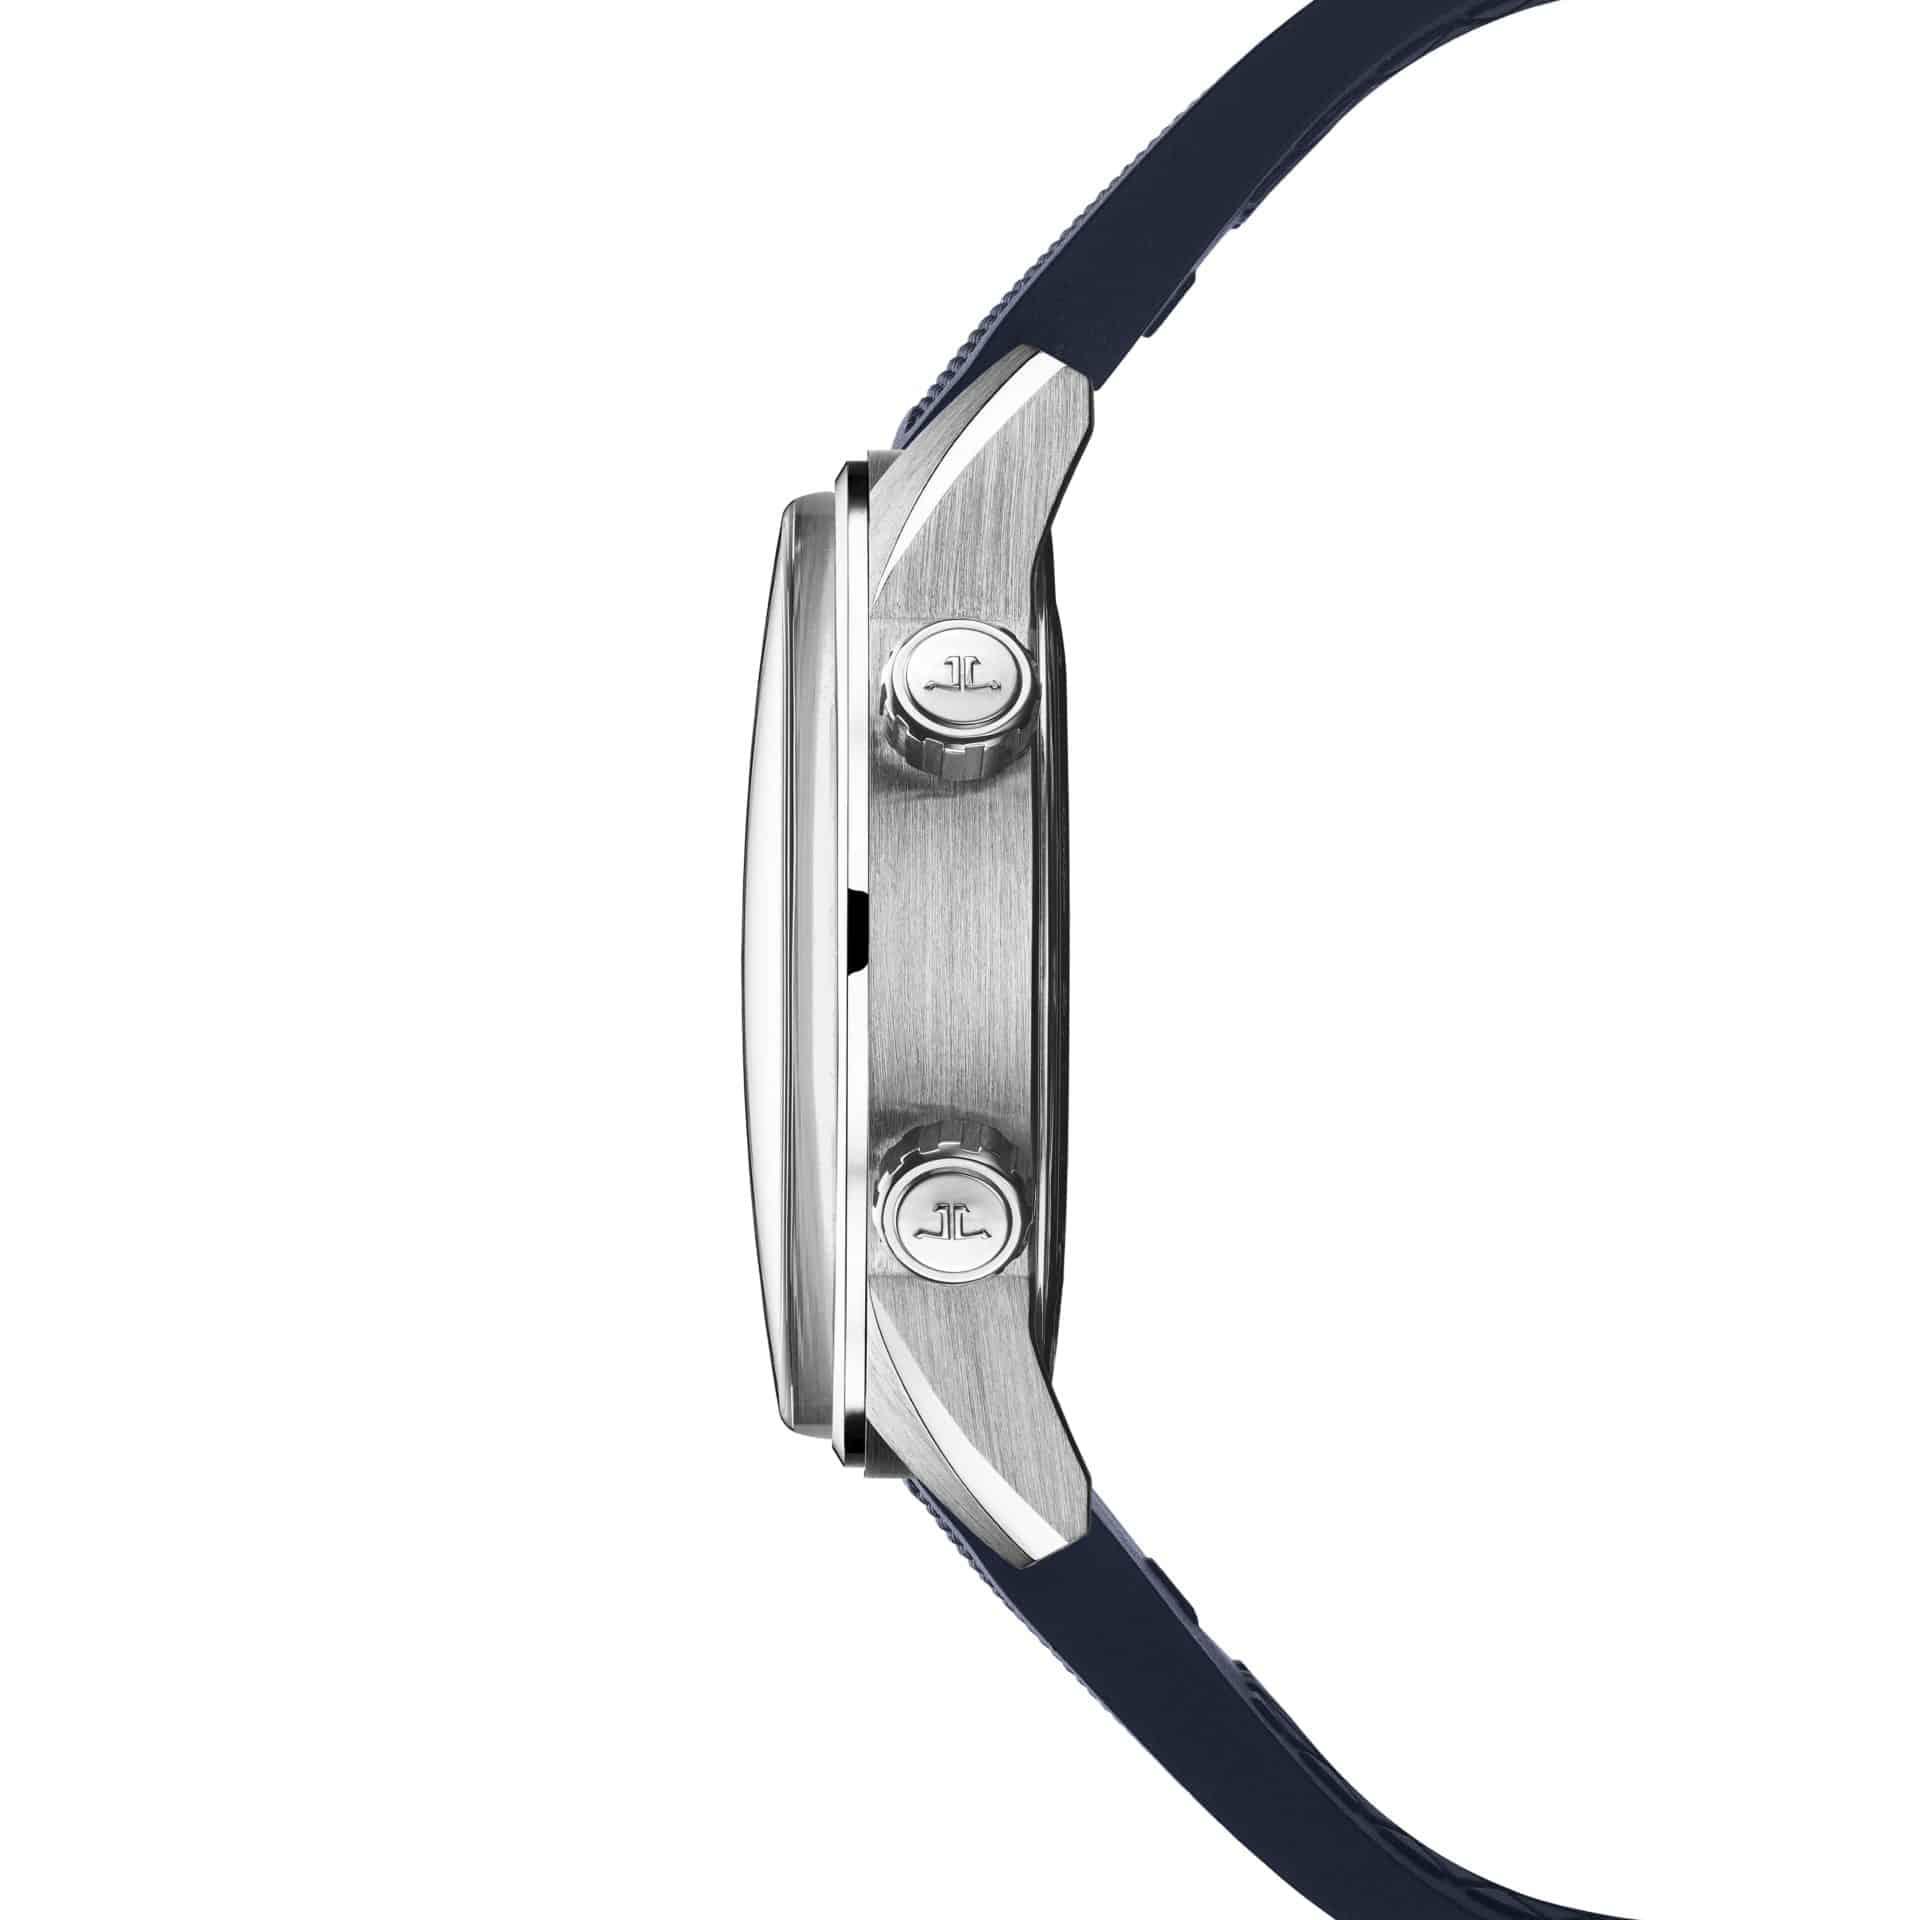 Jaeger leCoultre Polaris Date limited Edition 2019 SE